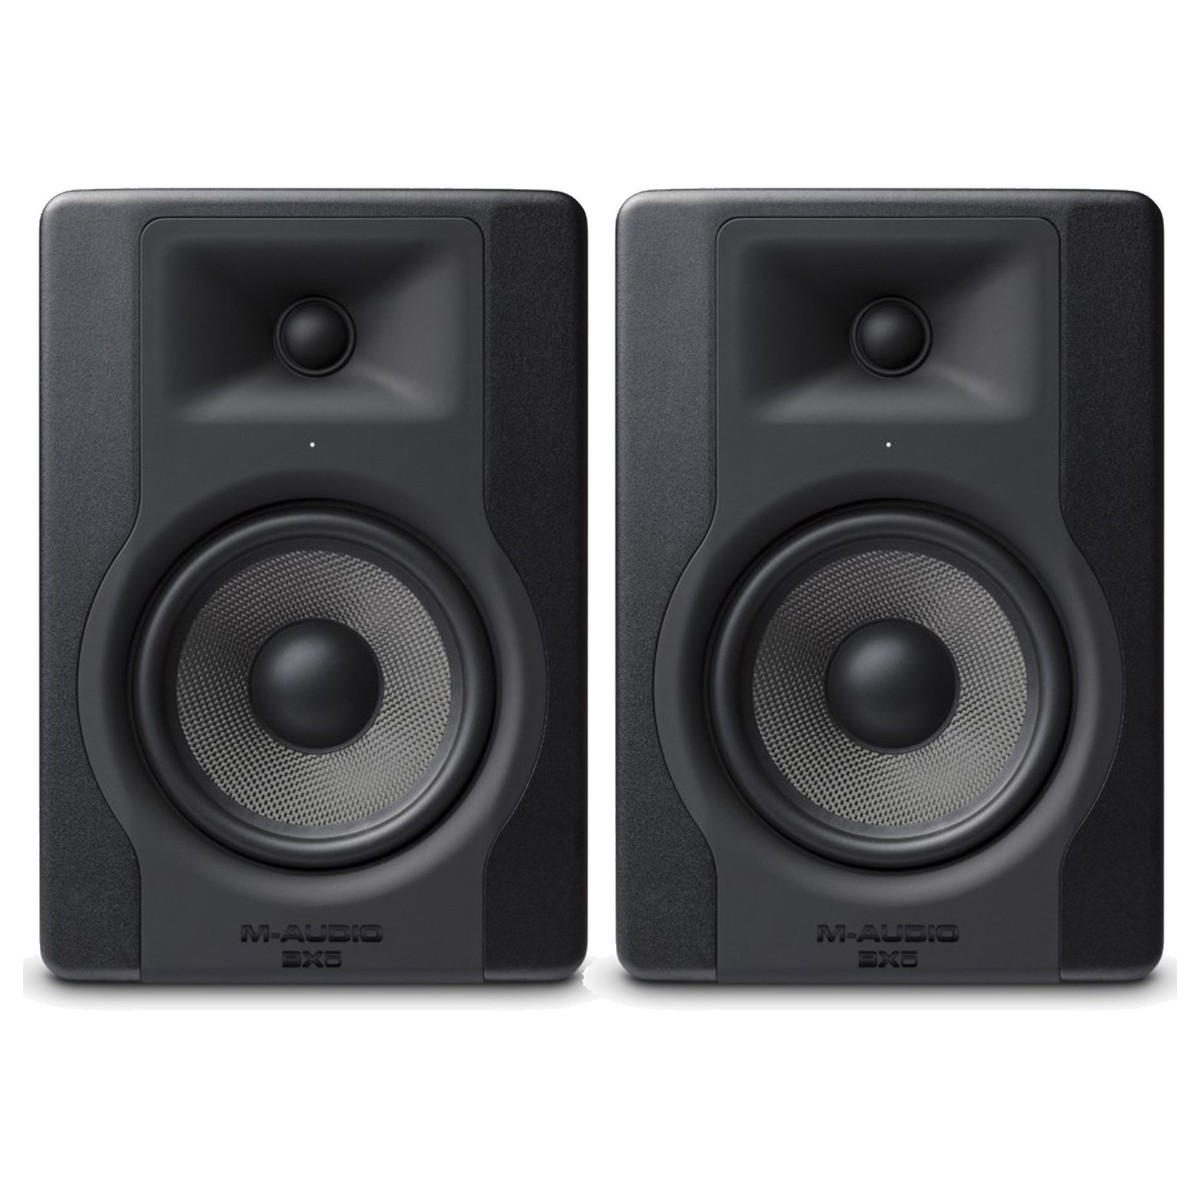 M Audio Bx5 D3 Studio Monitors Pair At Gear4music Fender Roland Ready Strat Wiring Diagram Main Loading Zoom